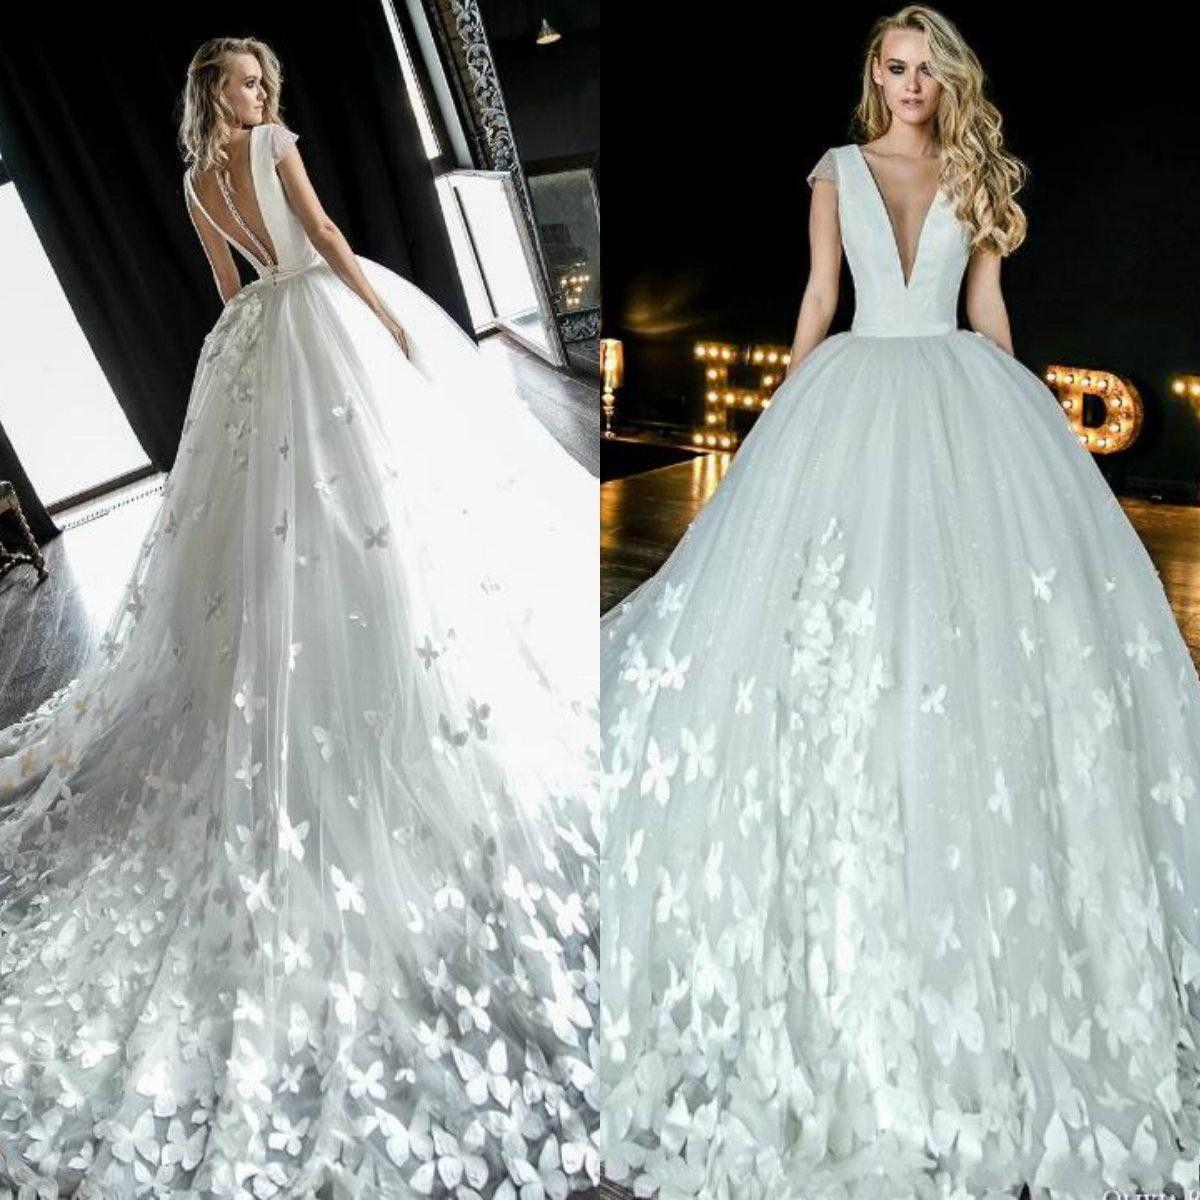 Olivia Bottega 2020 Suknie ślubne V Neck Cap Sleeve Romantic Motyl Aplikacje Tulle Suknie Ślubne z Sheer Buttons Powrót Suknia ślubna